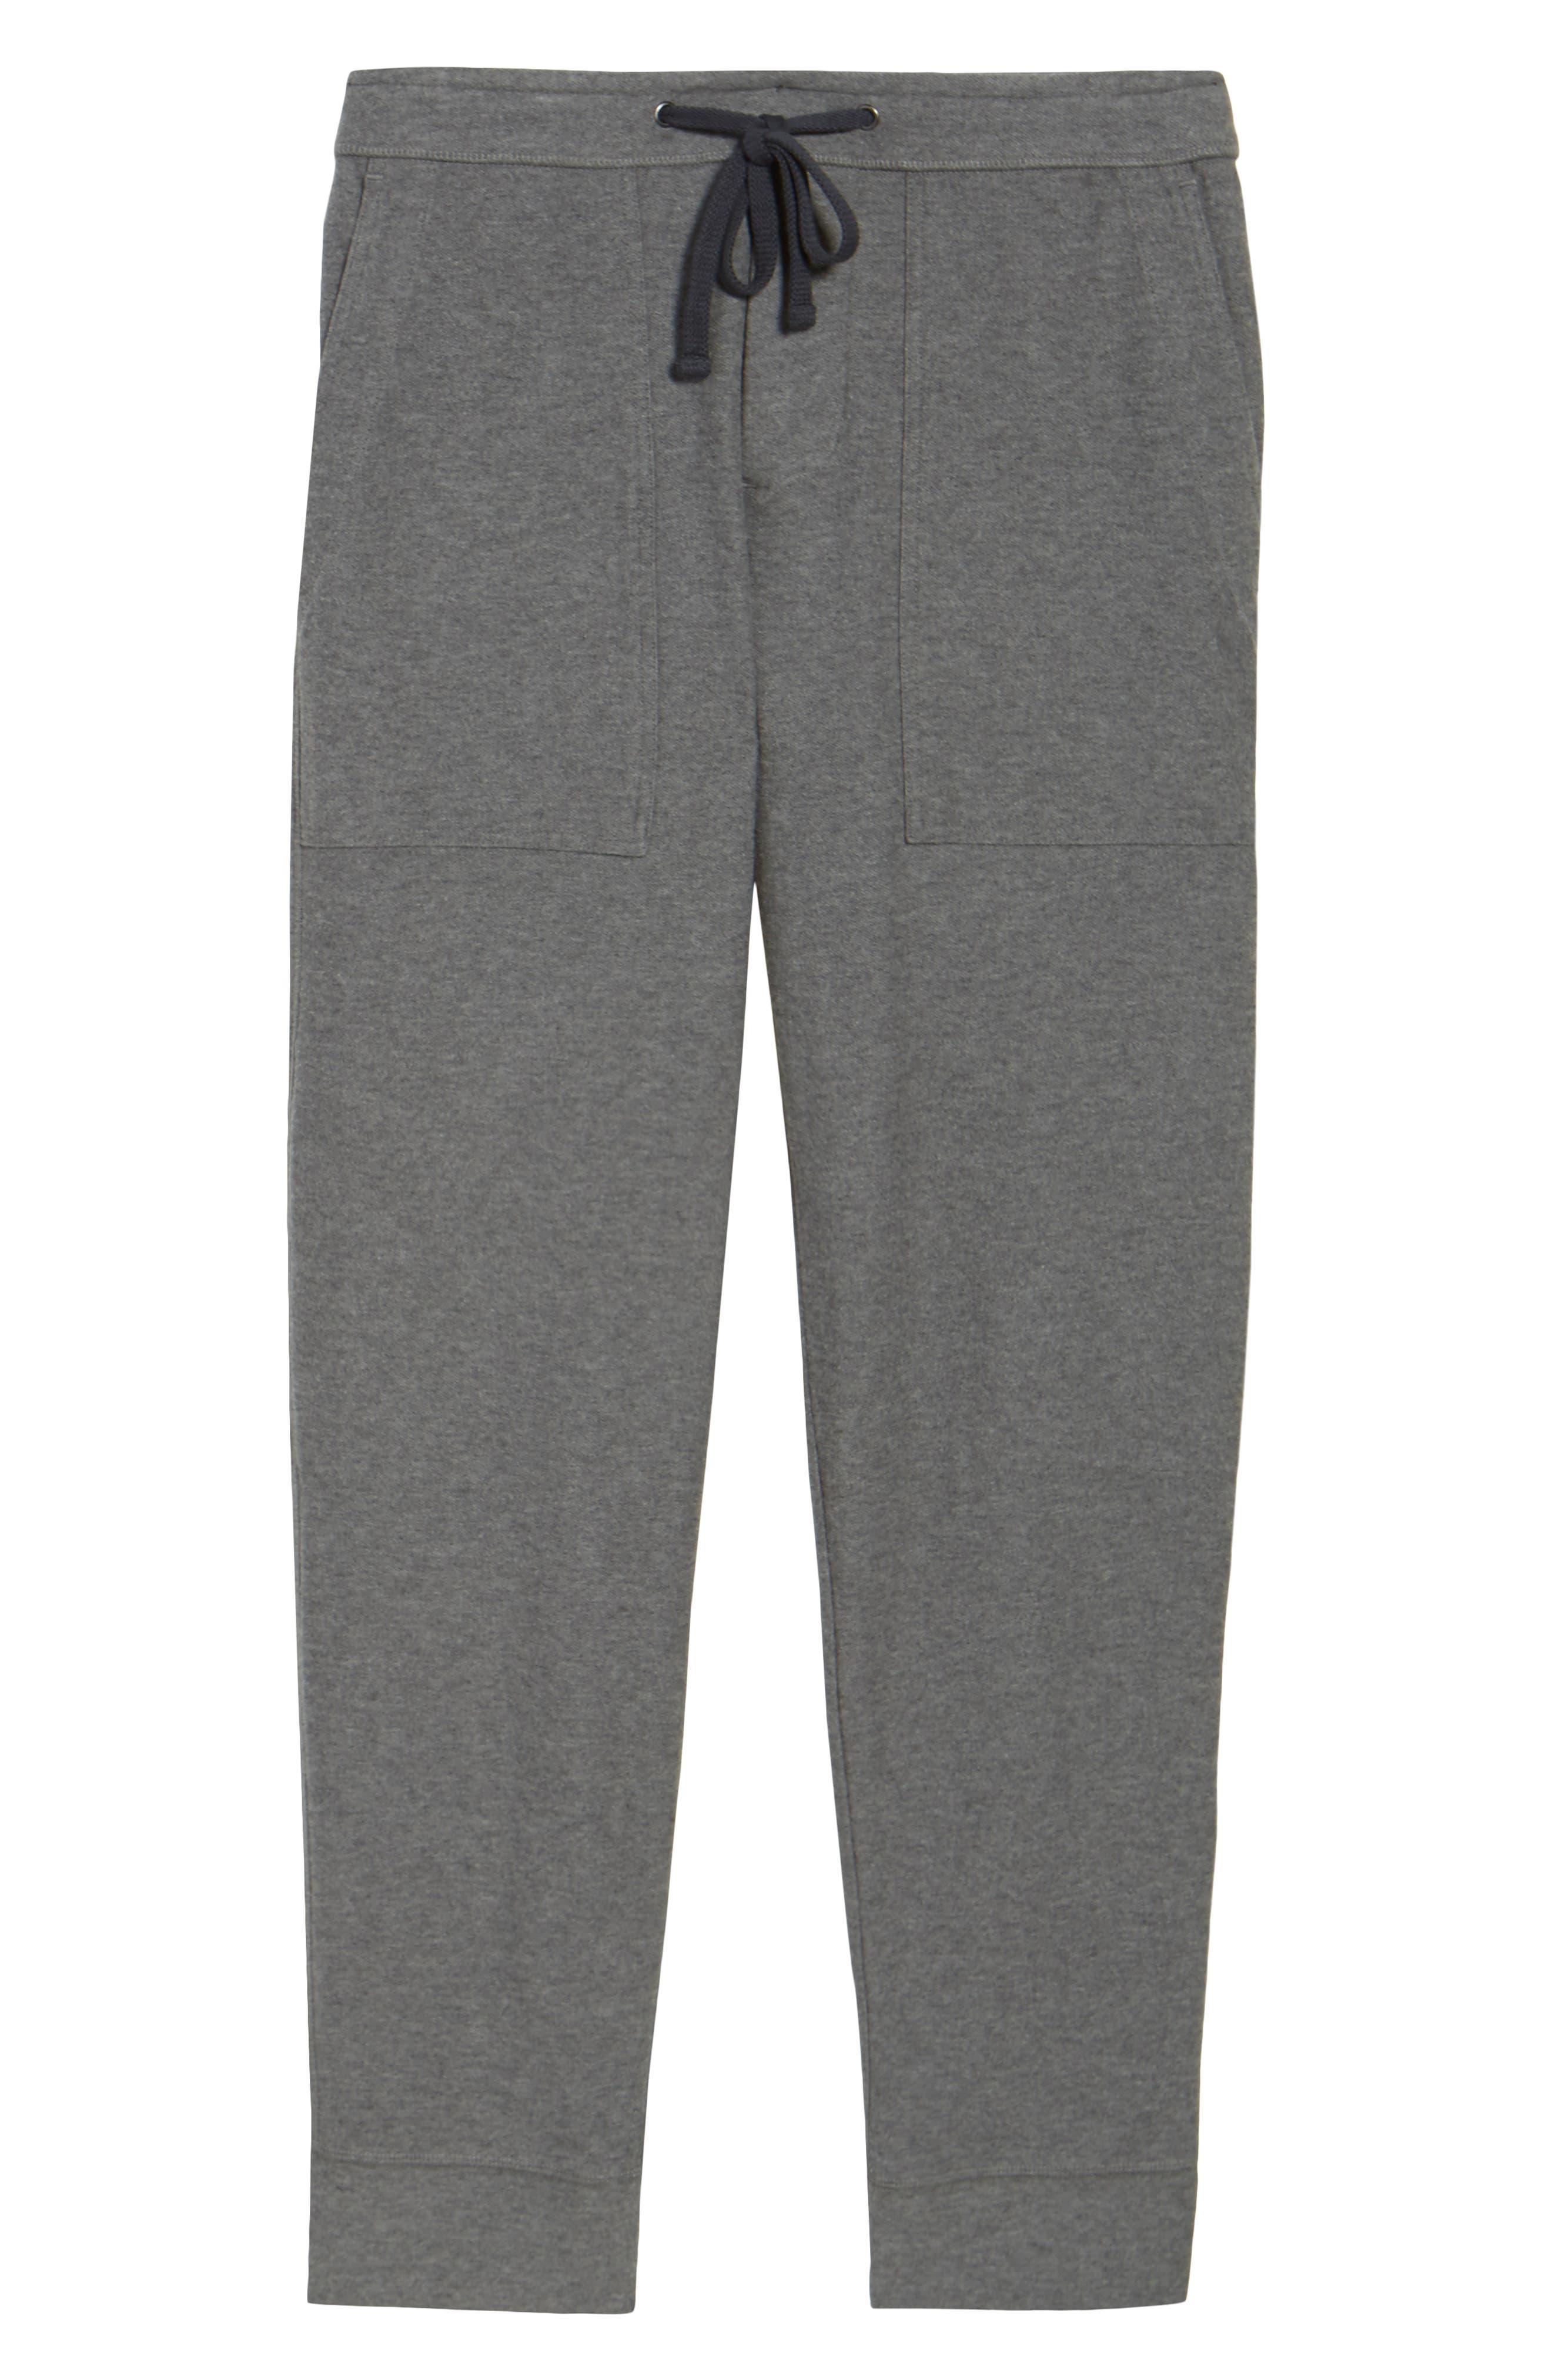 Heathered Knit Lounge Pants,                             Alternate thumbnail 6, color,                             086